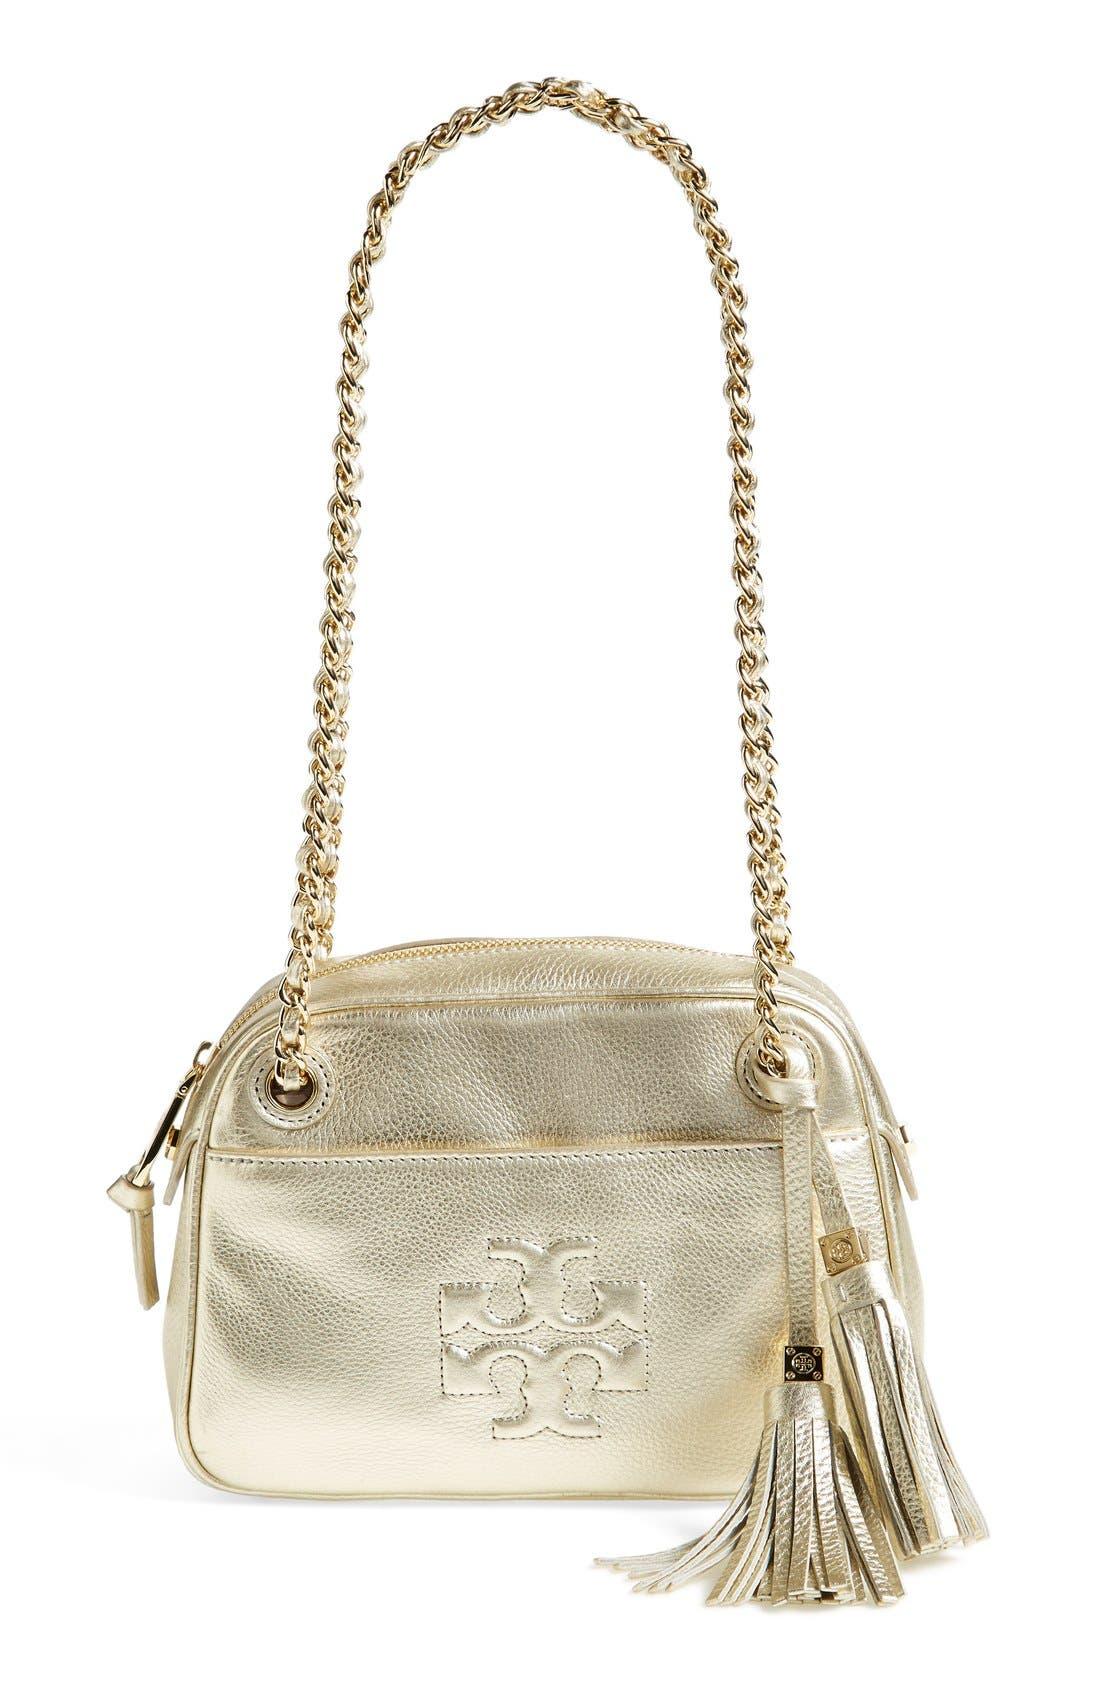 Alternate Image 1 Selected - Tory Burch 'Thea' Metallic Leather Crossbody Bag